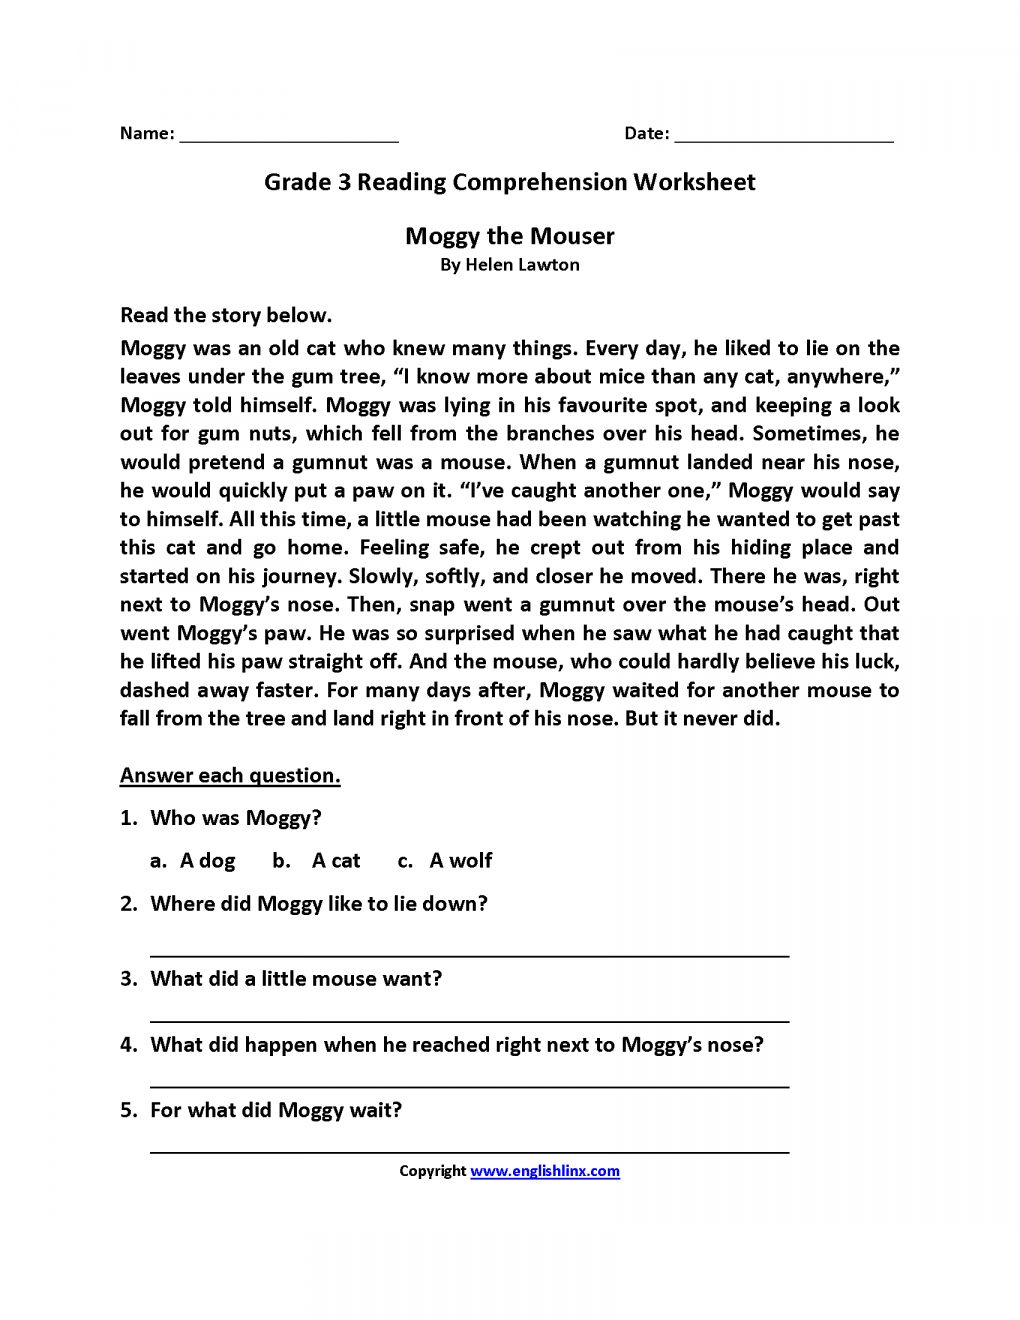 Spider Reading Comprehension Worksheet and Reading